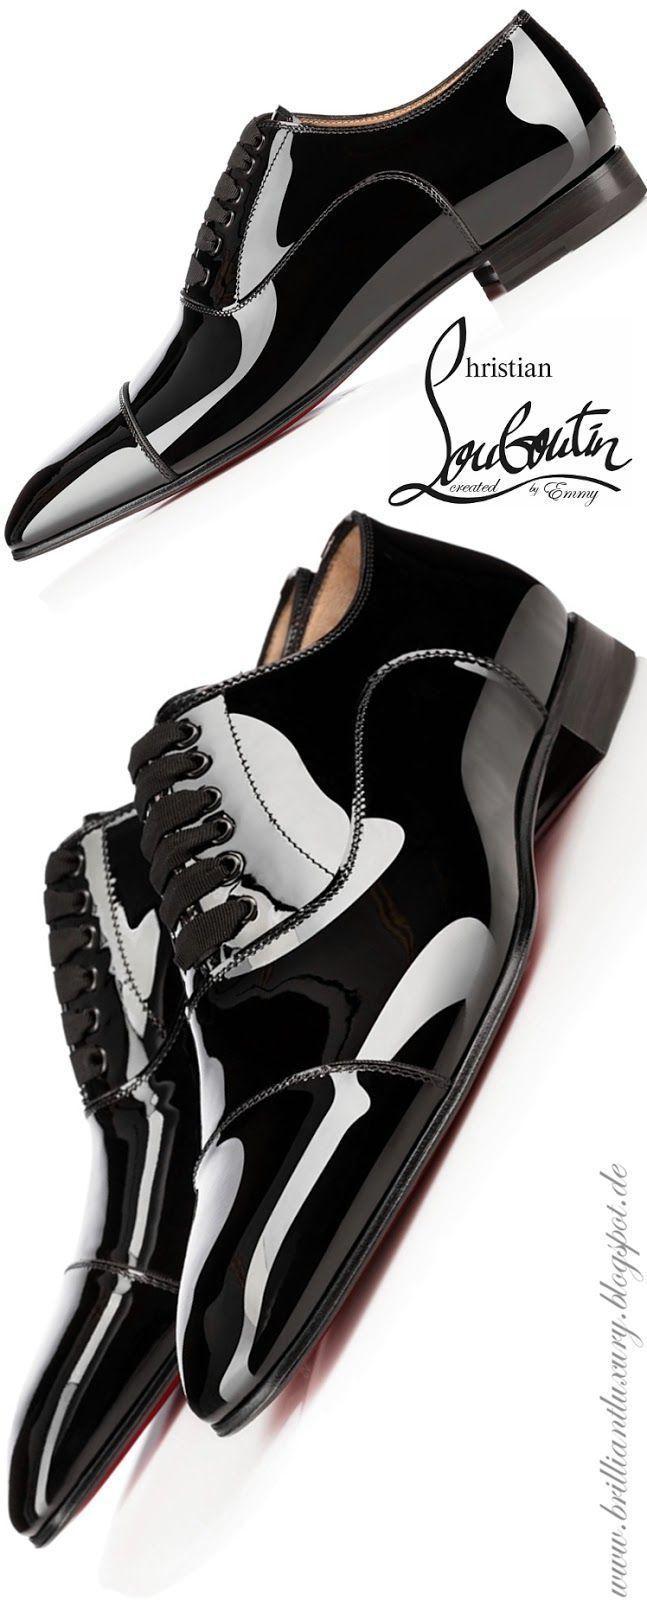 check out 59cae b4f73 Brilliant Luxury ♢ Christian Louboutin Greggo Flat ...